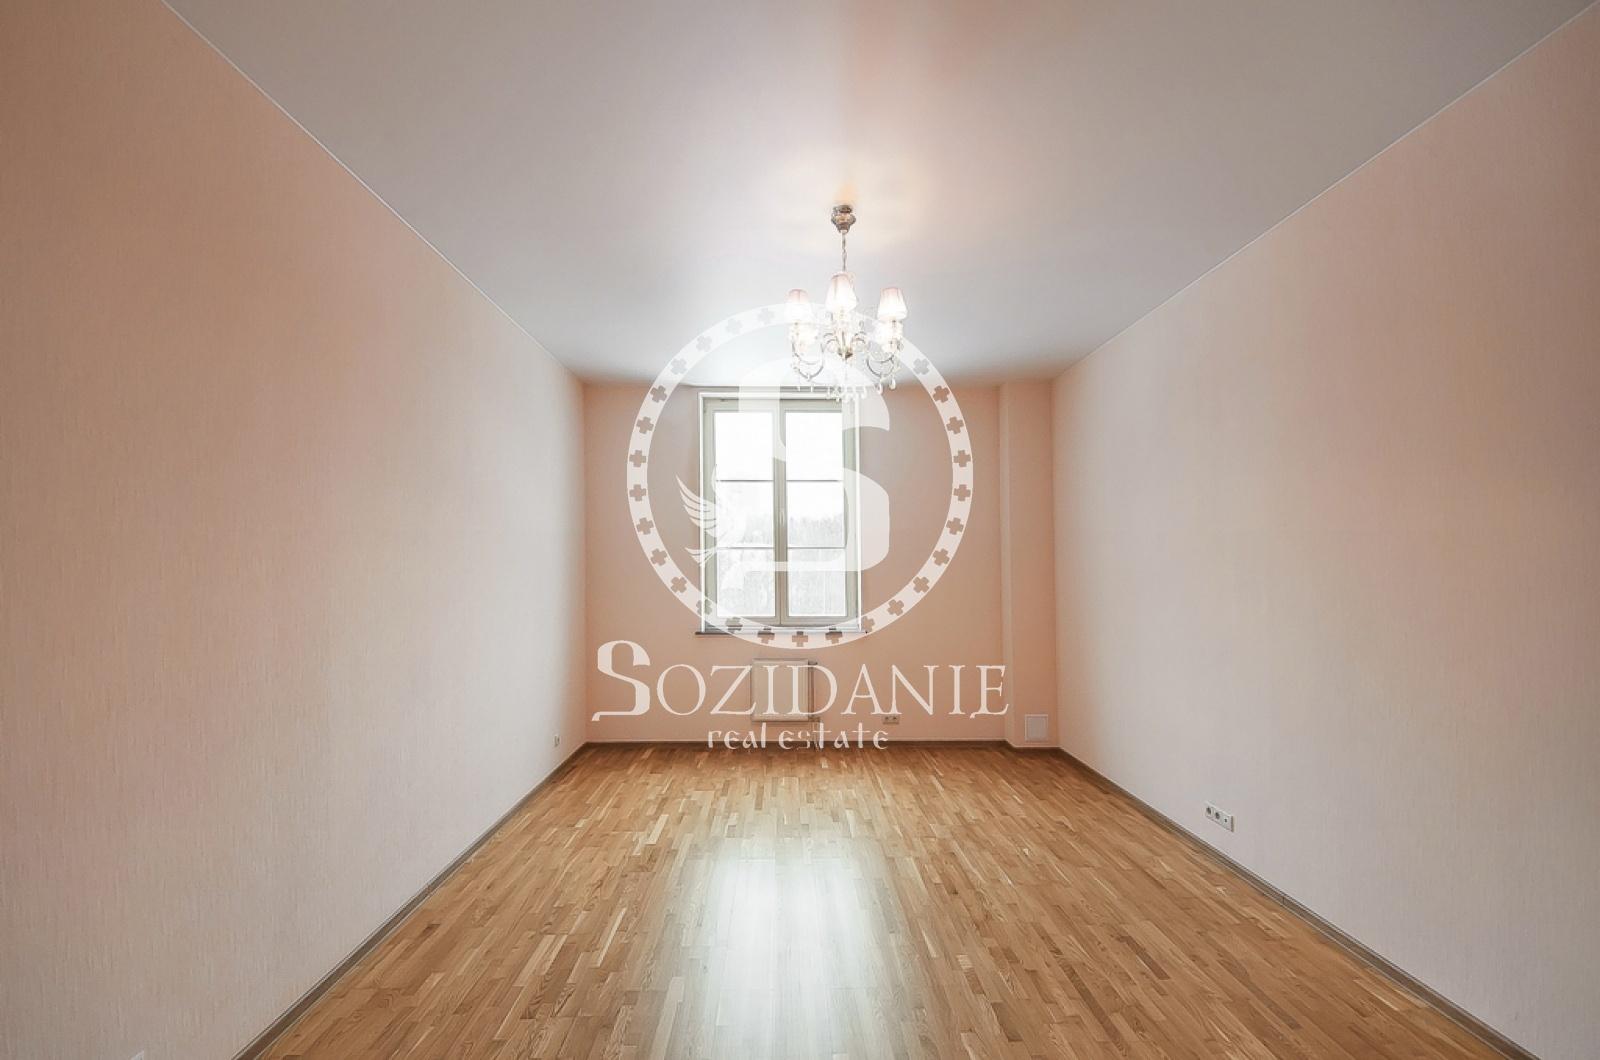 5 Комнаты, Городская, Аренда, Улица Береговая, Listing ID 1146, Москва, Россия,